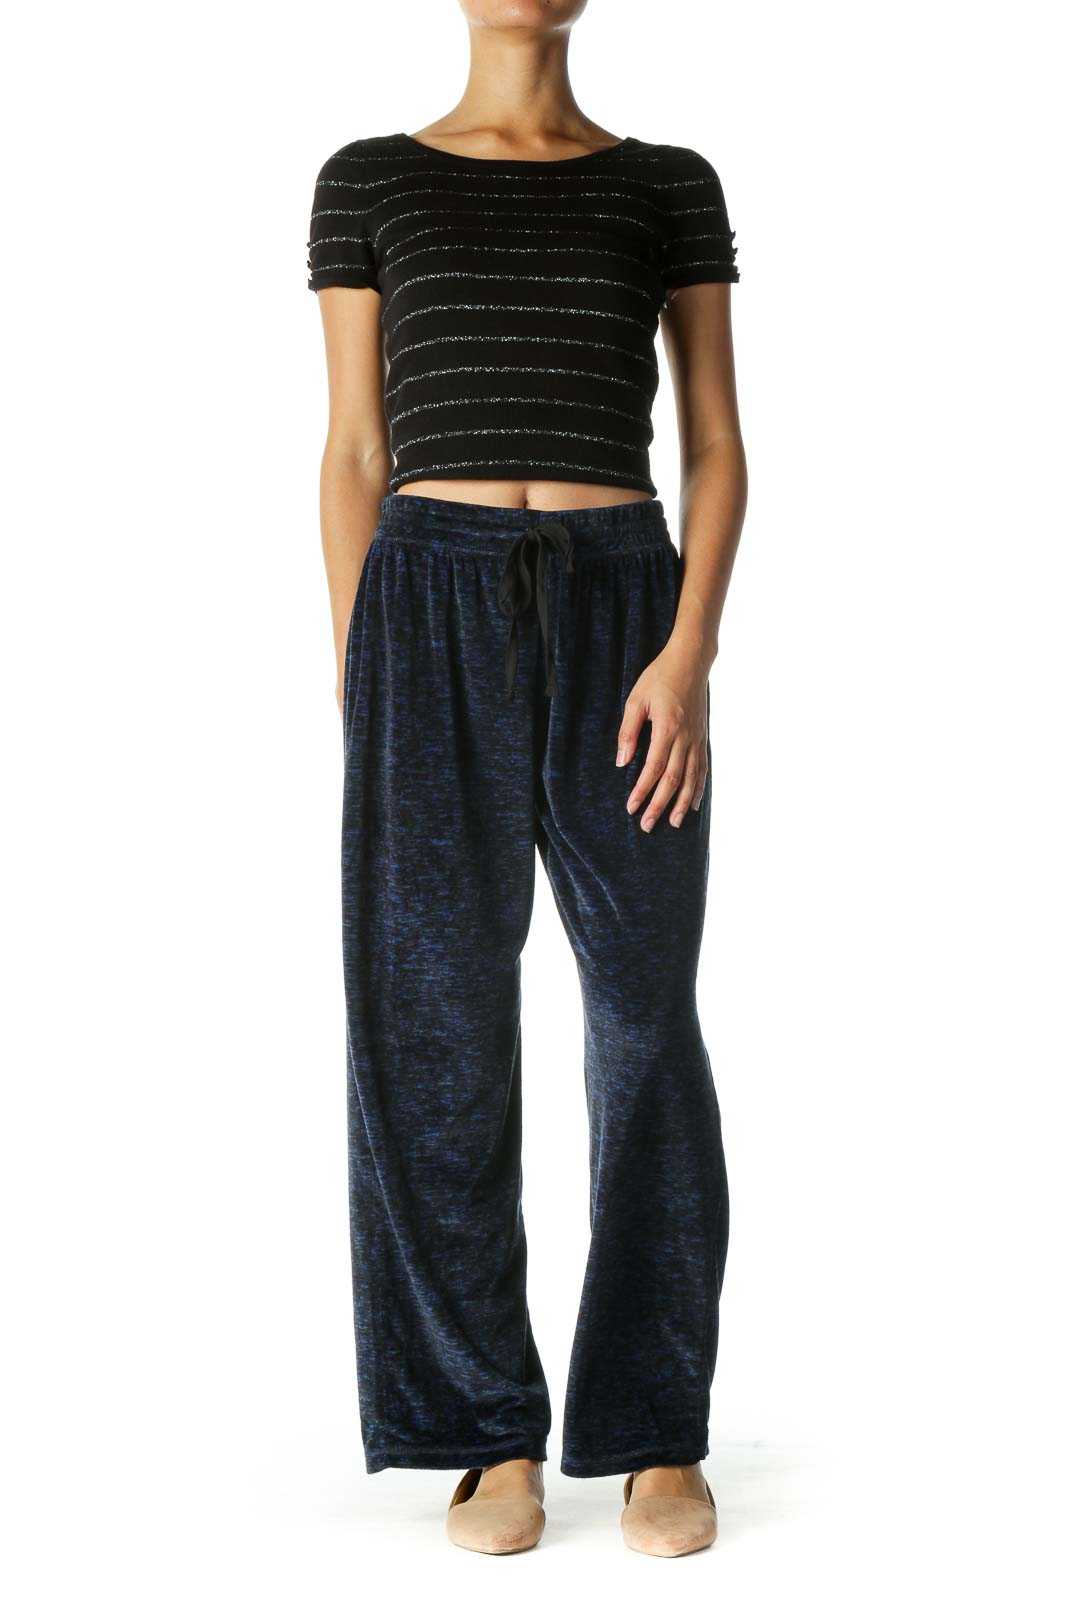 Black and Blue Print Sports Pants